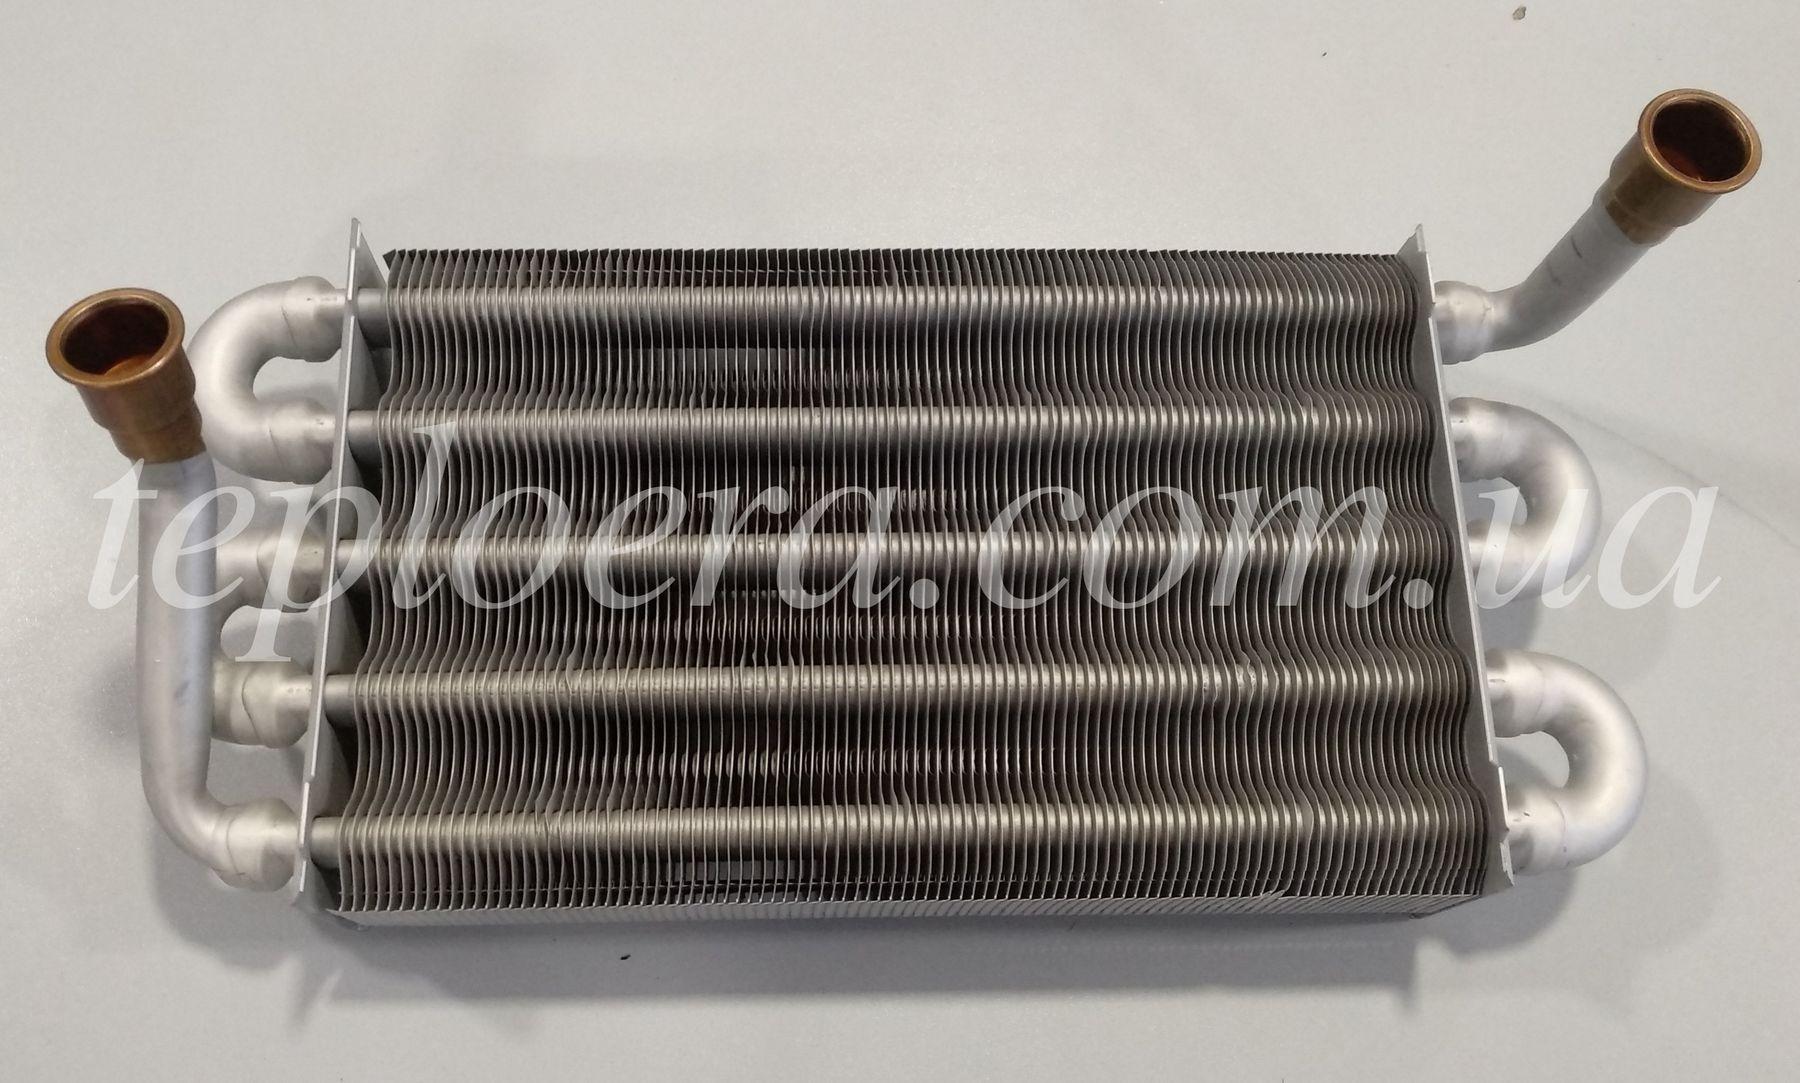 Kupiti Teploobminnik Saunier Duval Themaclassic C25 F25 S1059900 S10599 V Dnipri Teploera Com Ua